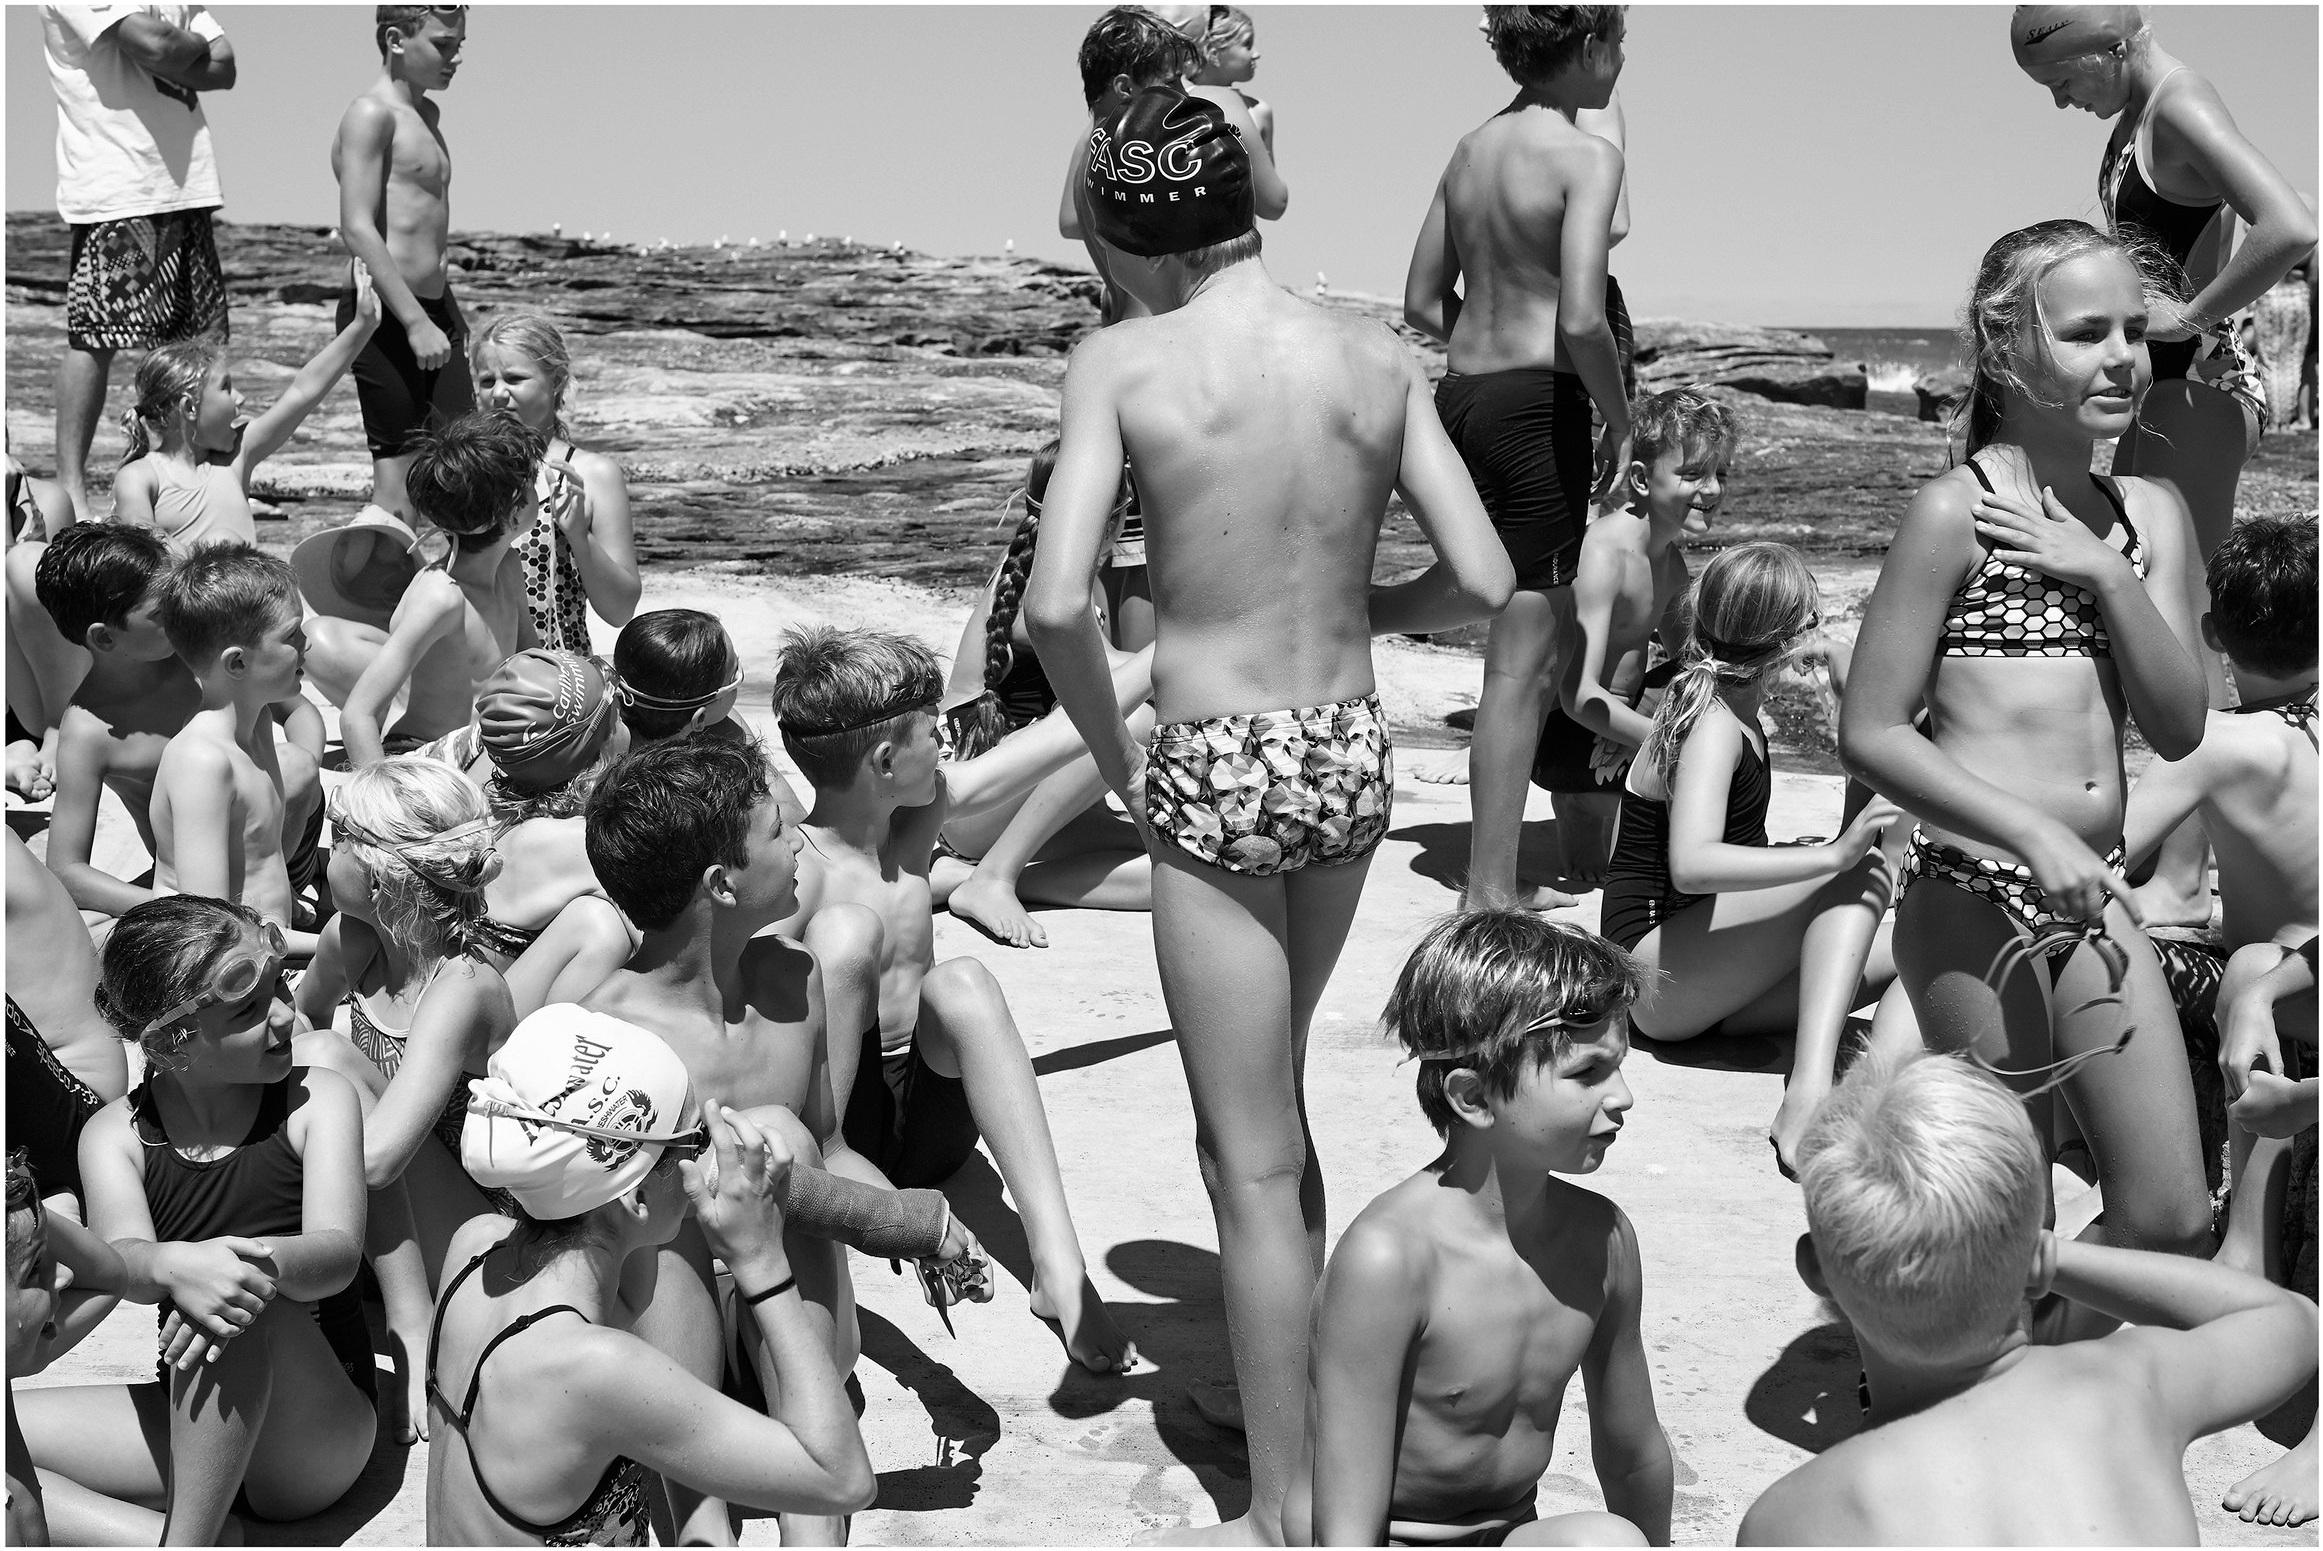 AUSTRLIAN BEACH SERIES -